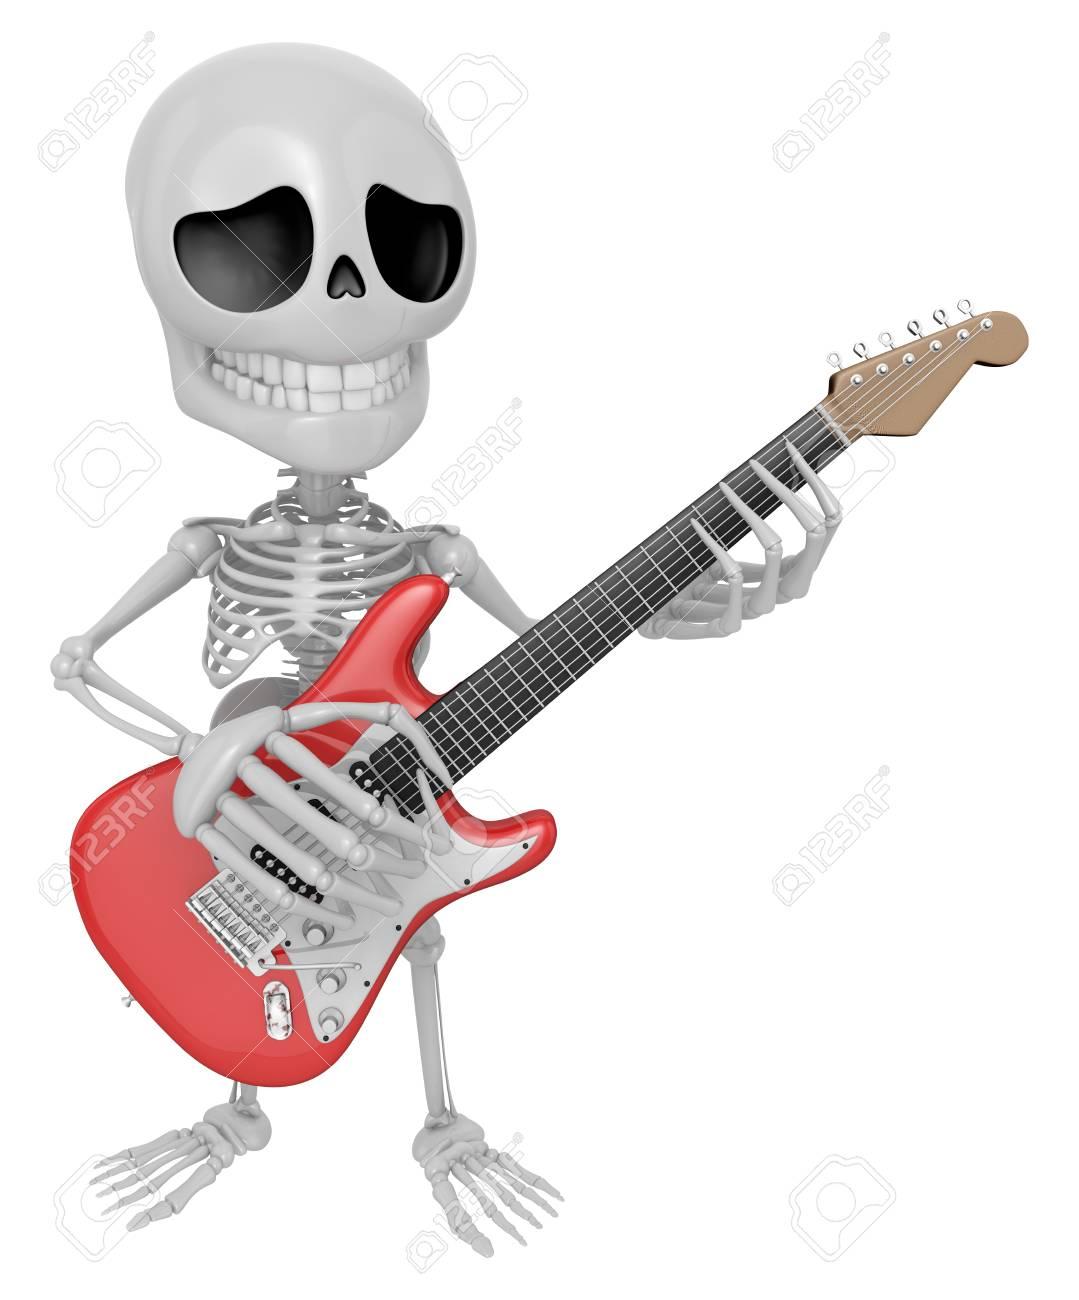 3D Esqueleto Mascota Tiene Que Estar Tocando La Guitarra Eléctrica ...